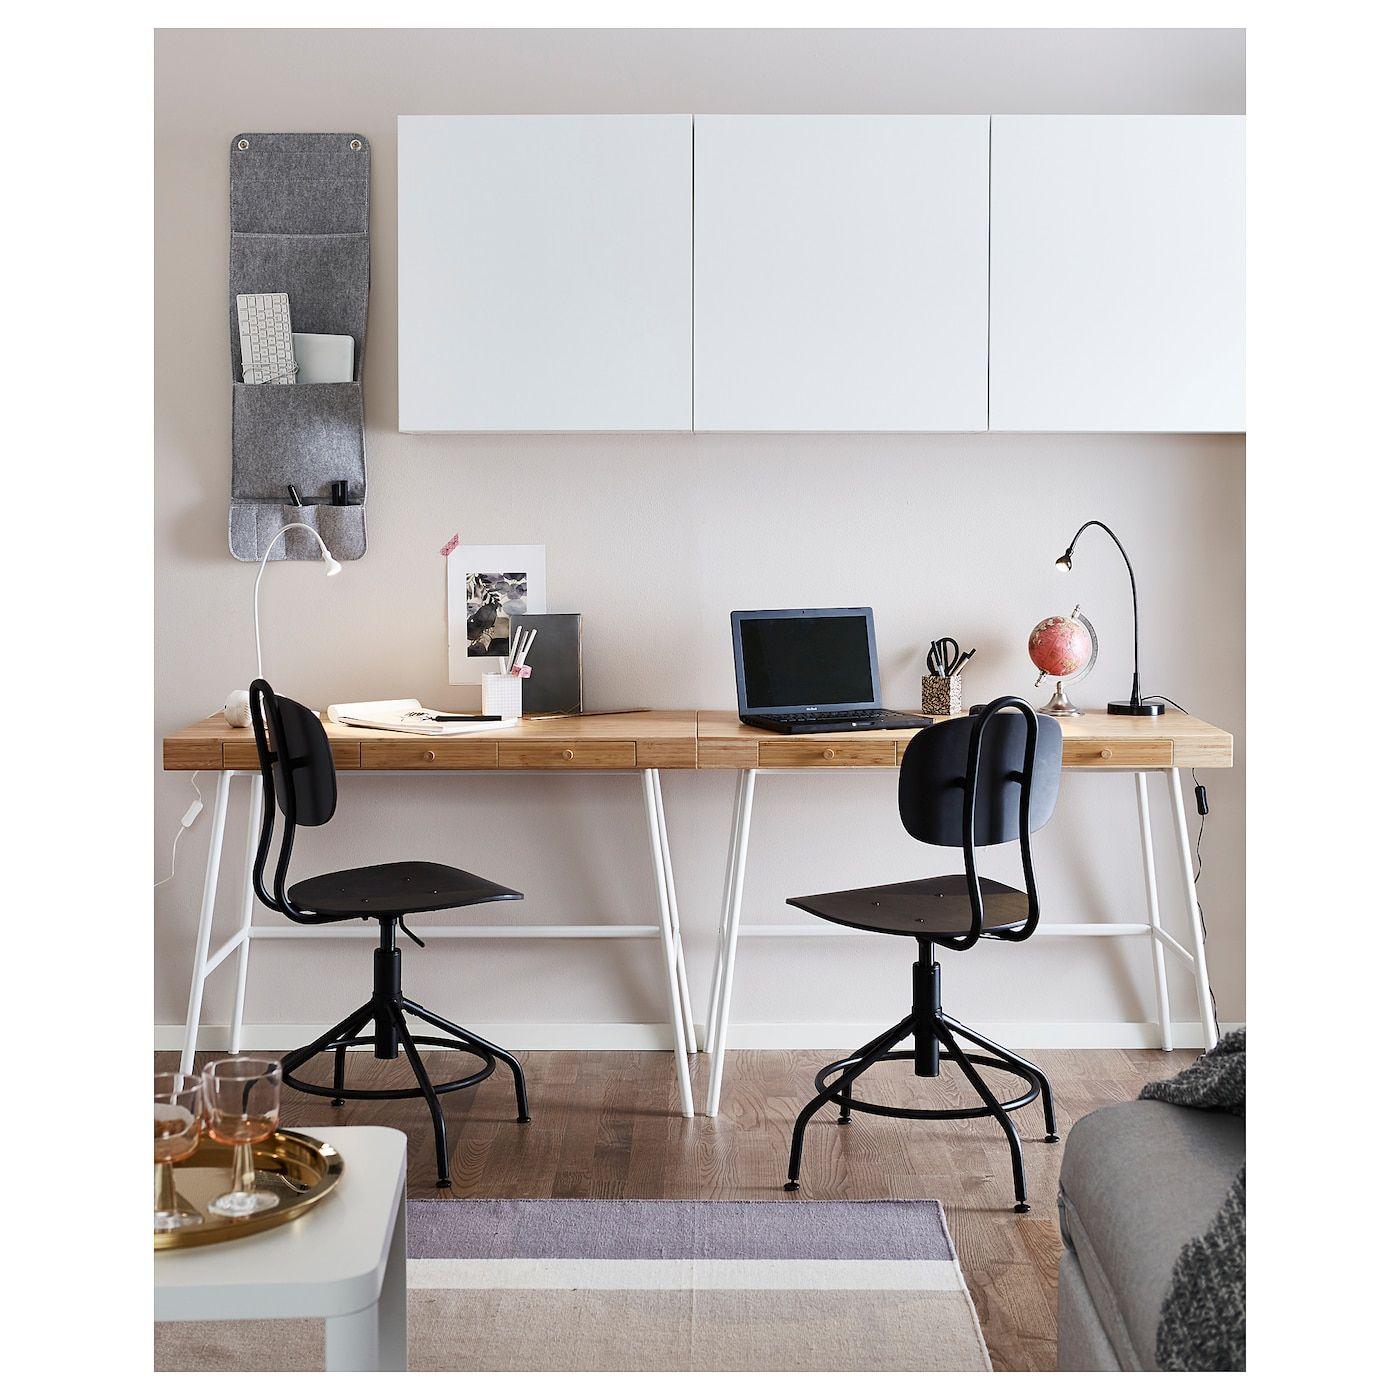 Kullaberg swivel chair black ikea furniture swivel chair